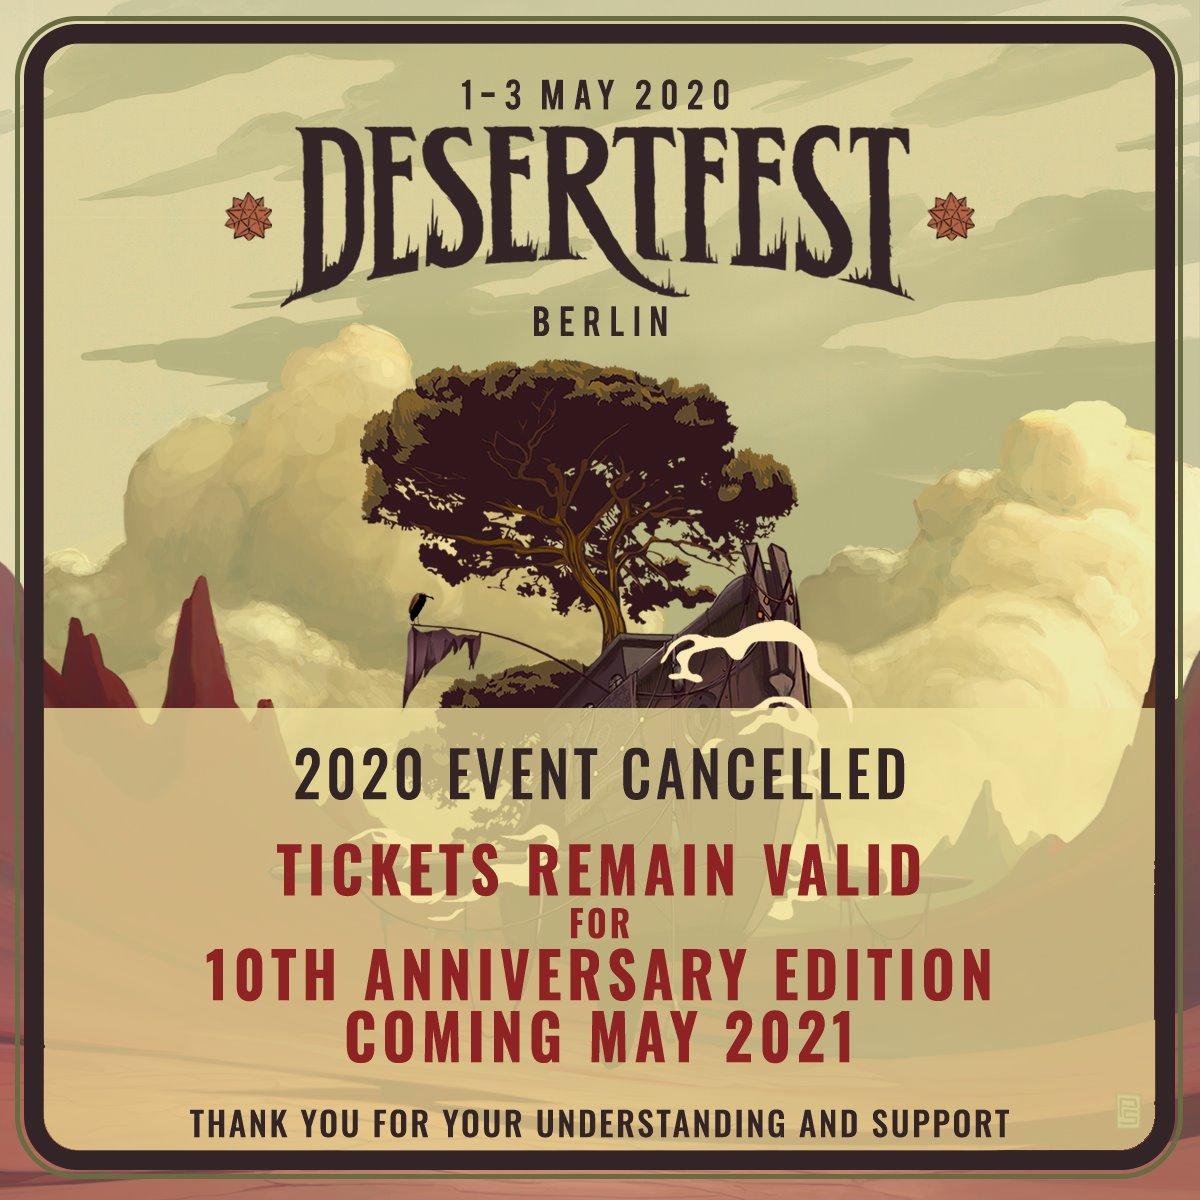 desertfest berlin 2020 off